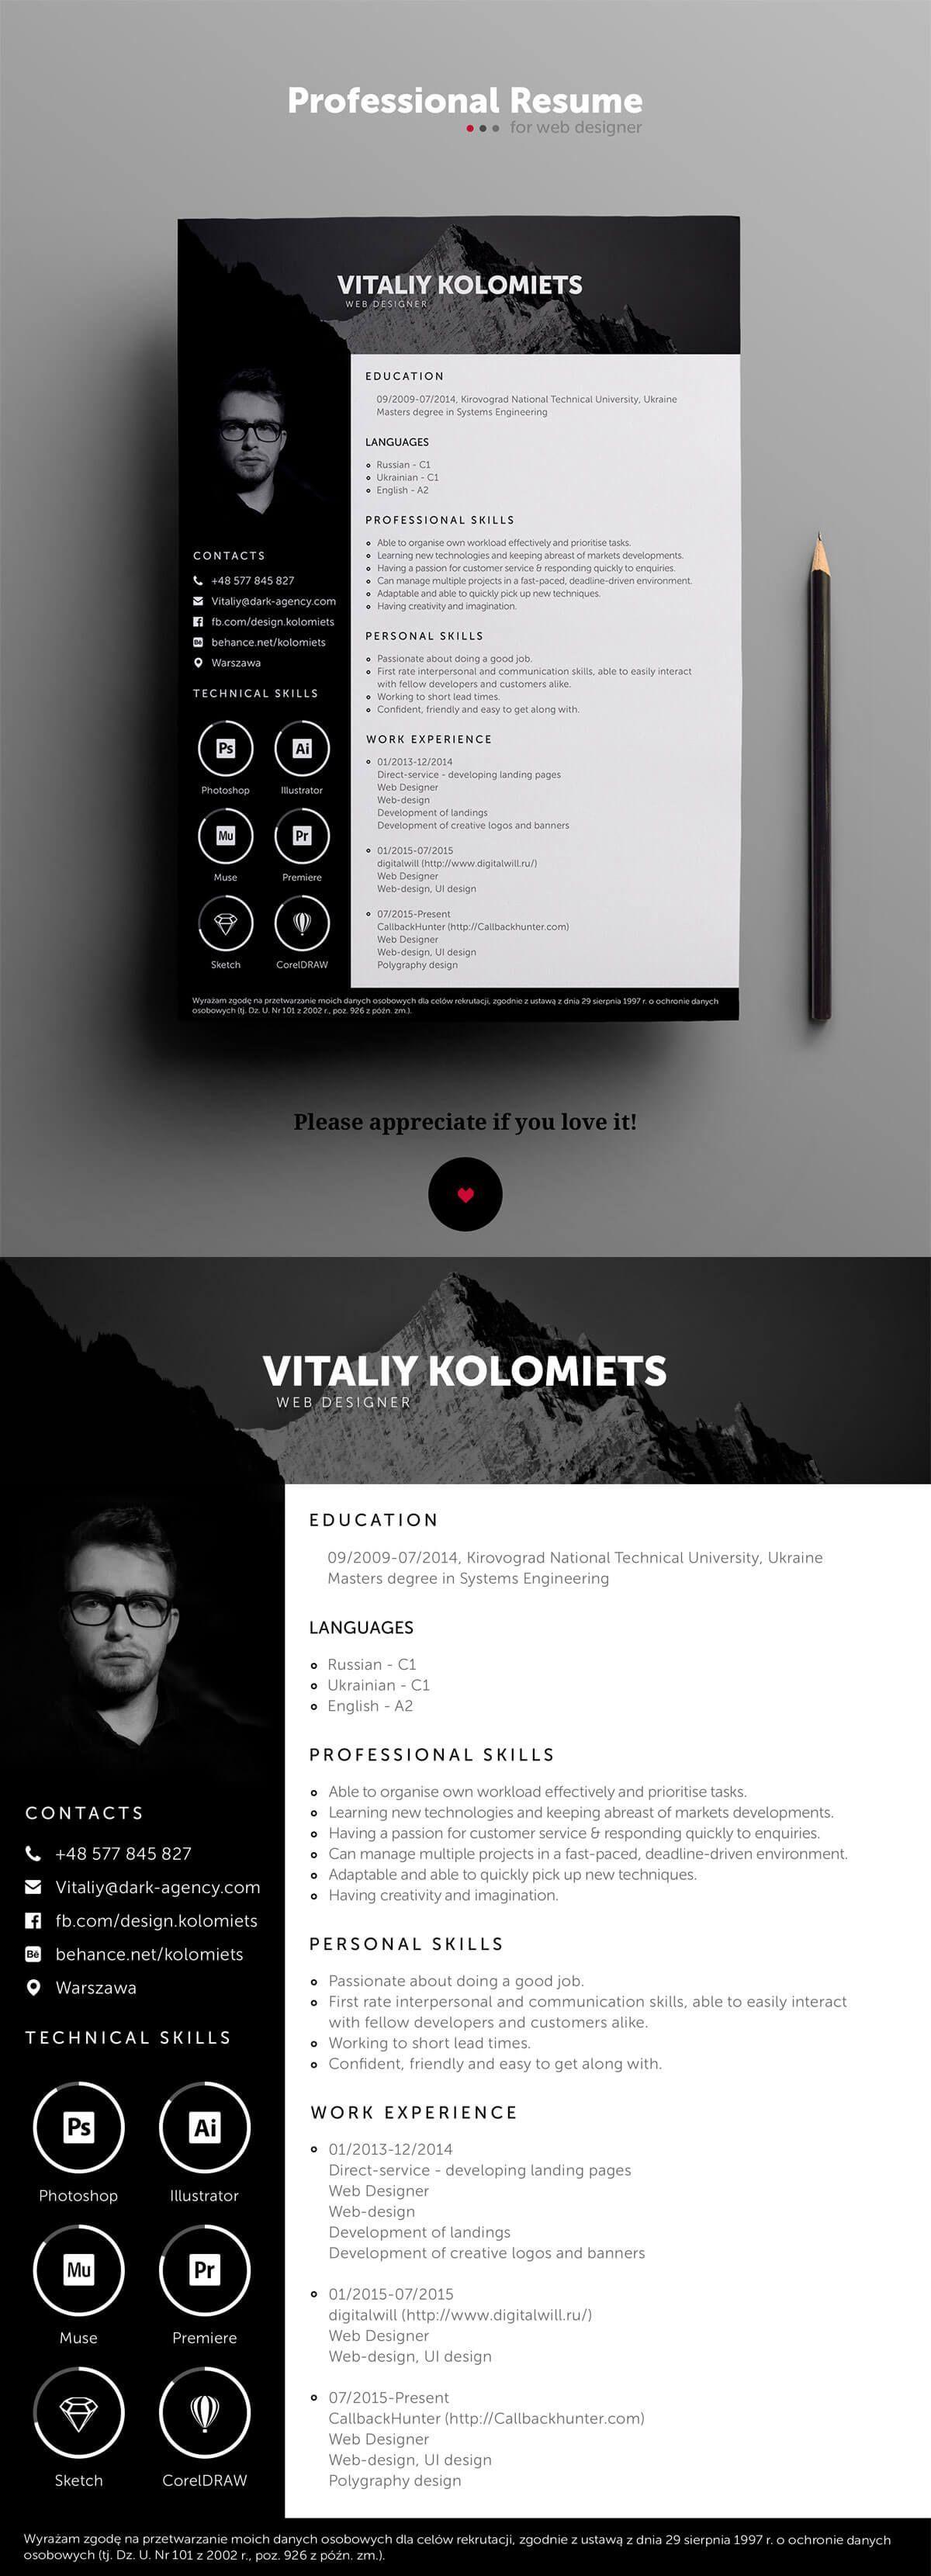 Modele De Cv Moderne Gratuit Graphic Design Resume Resume Design Creative Resume Design Free